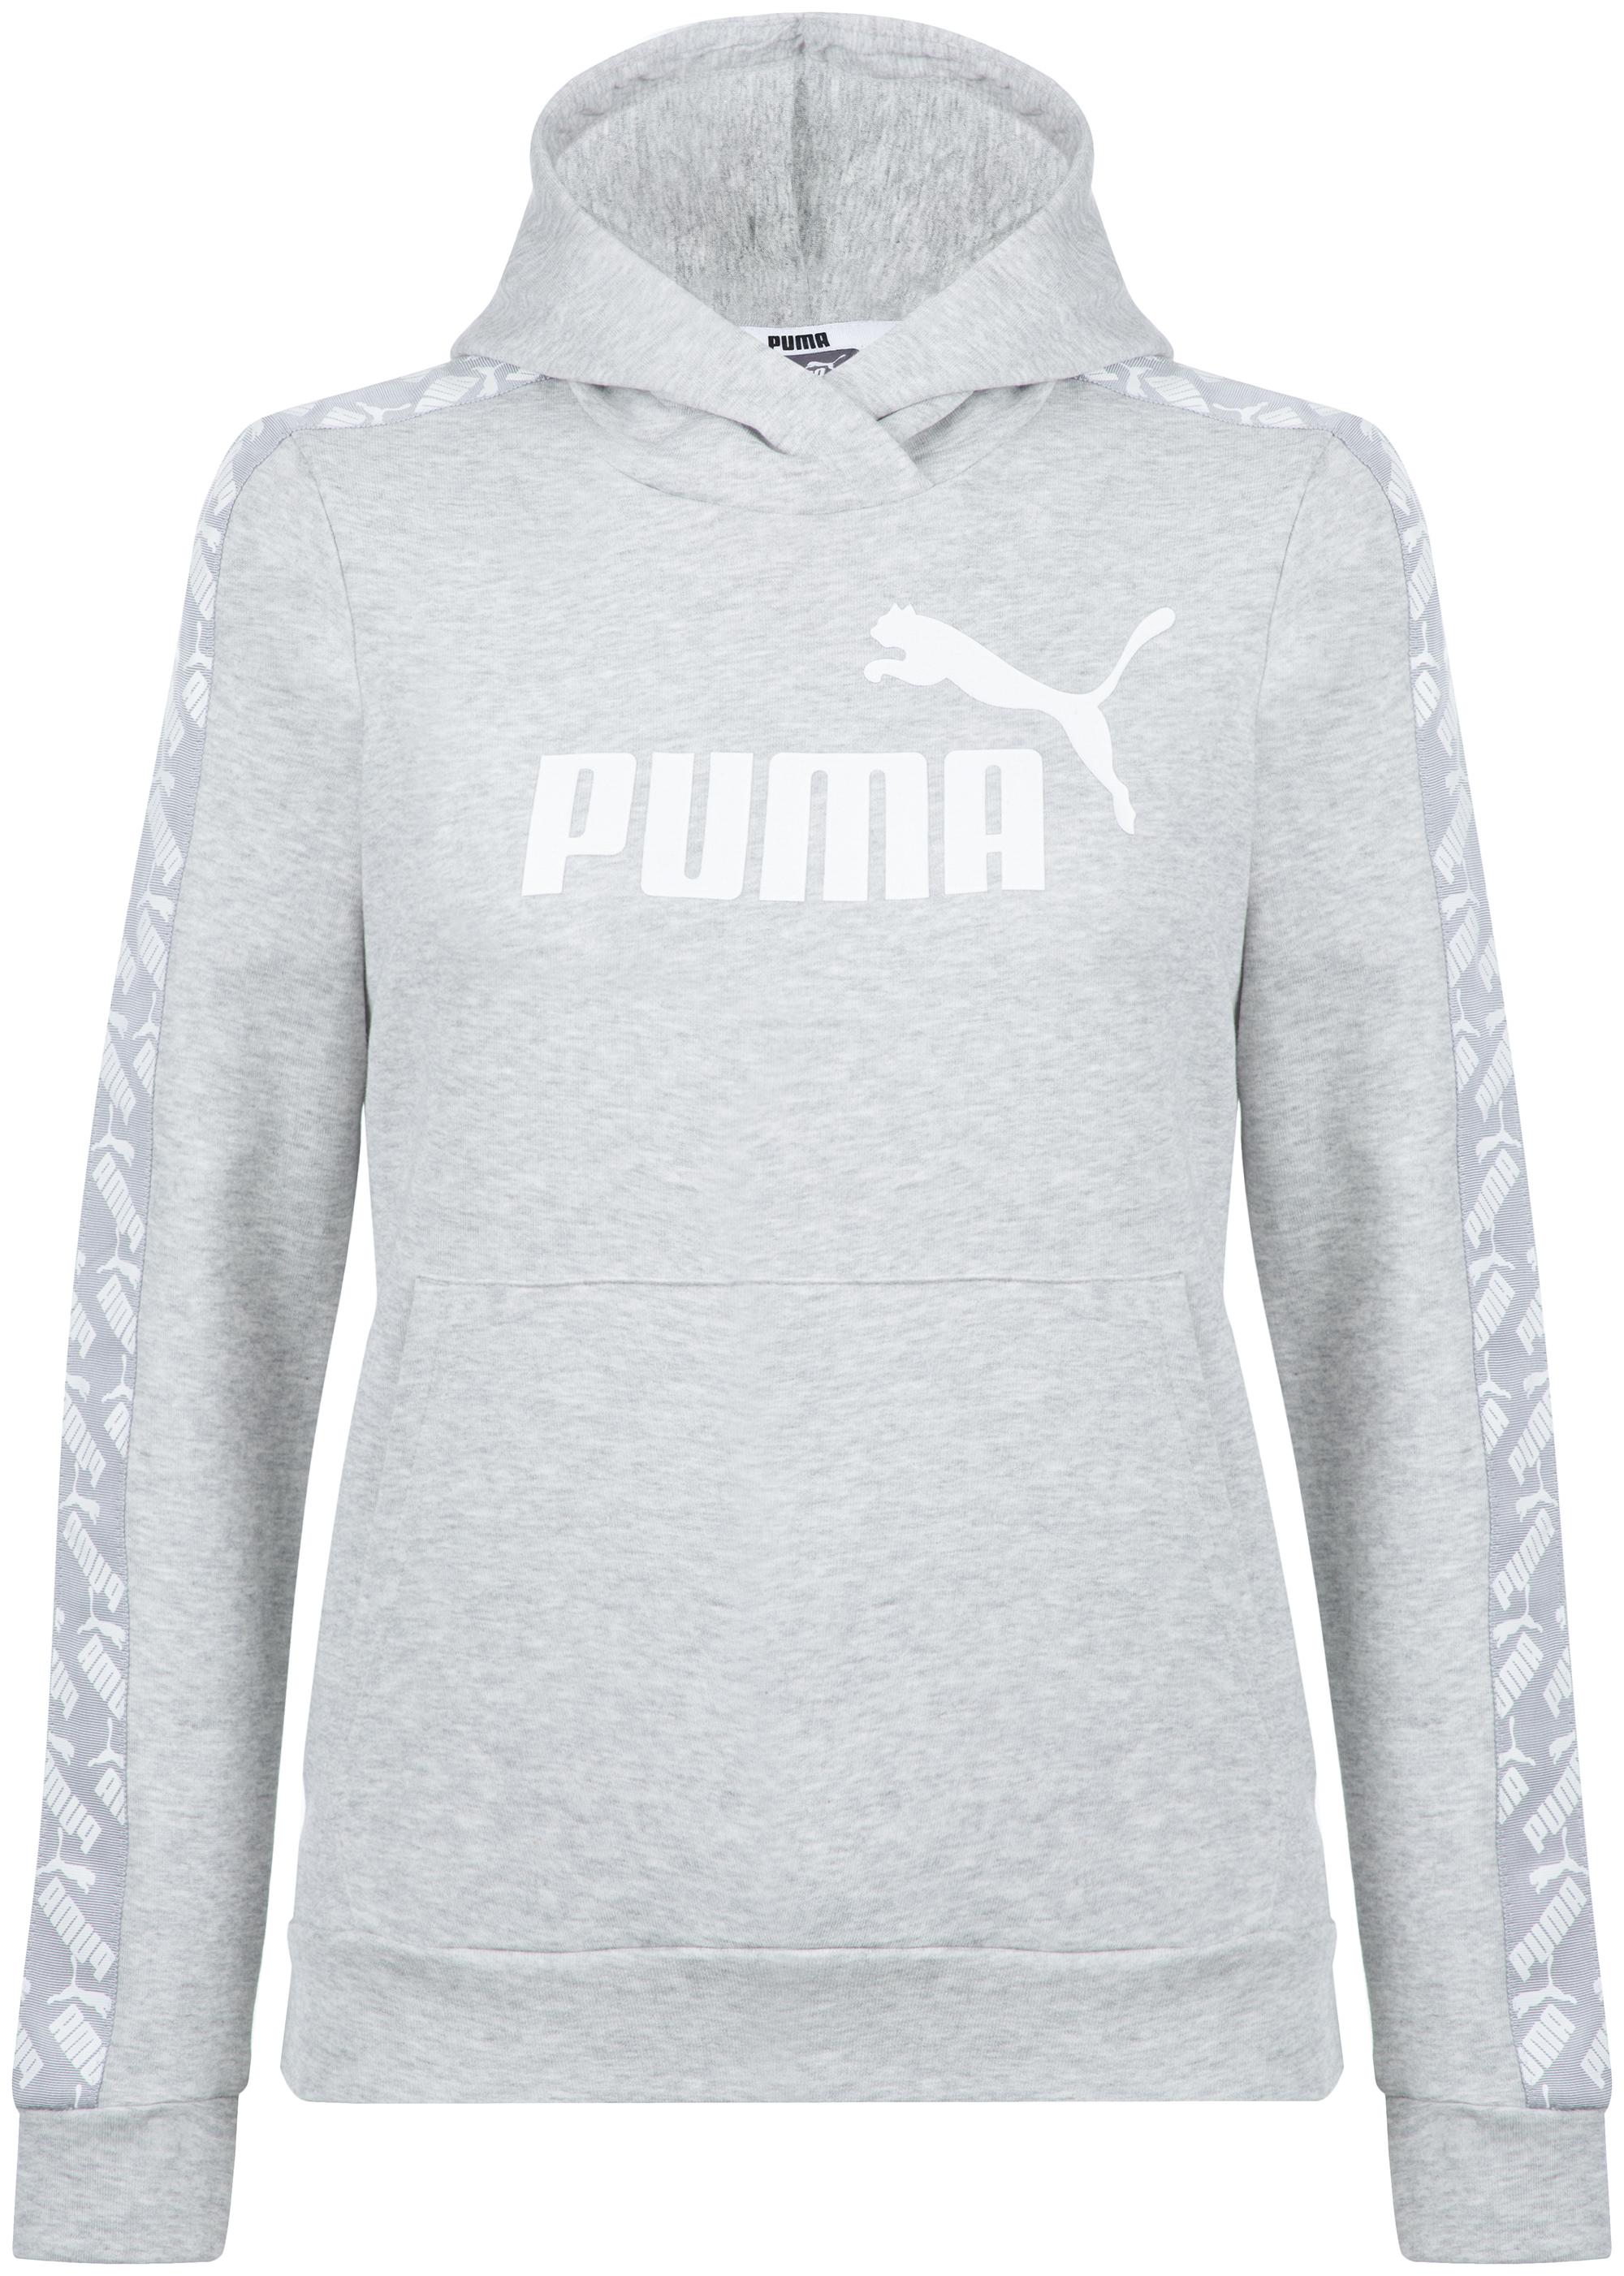 цены Puma Худи женская Puma Amplified Hoody TR, размер 46-48